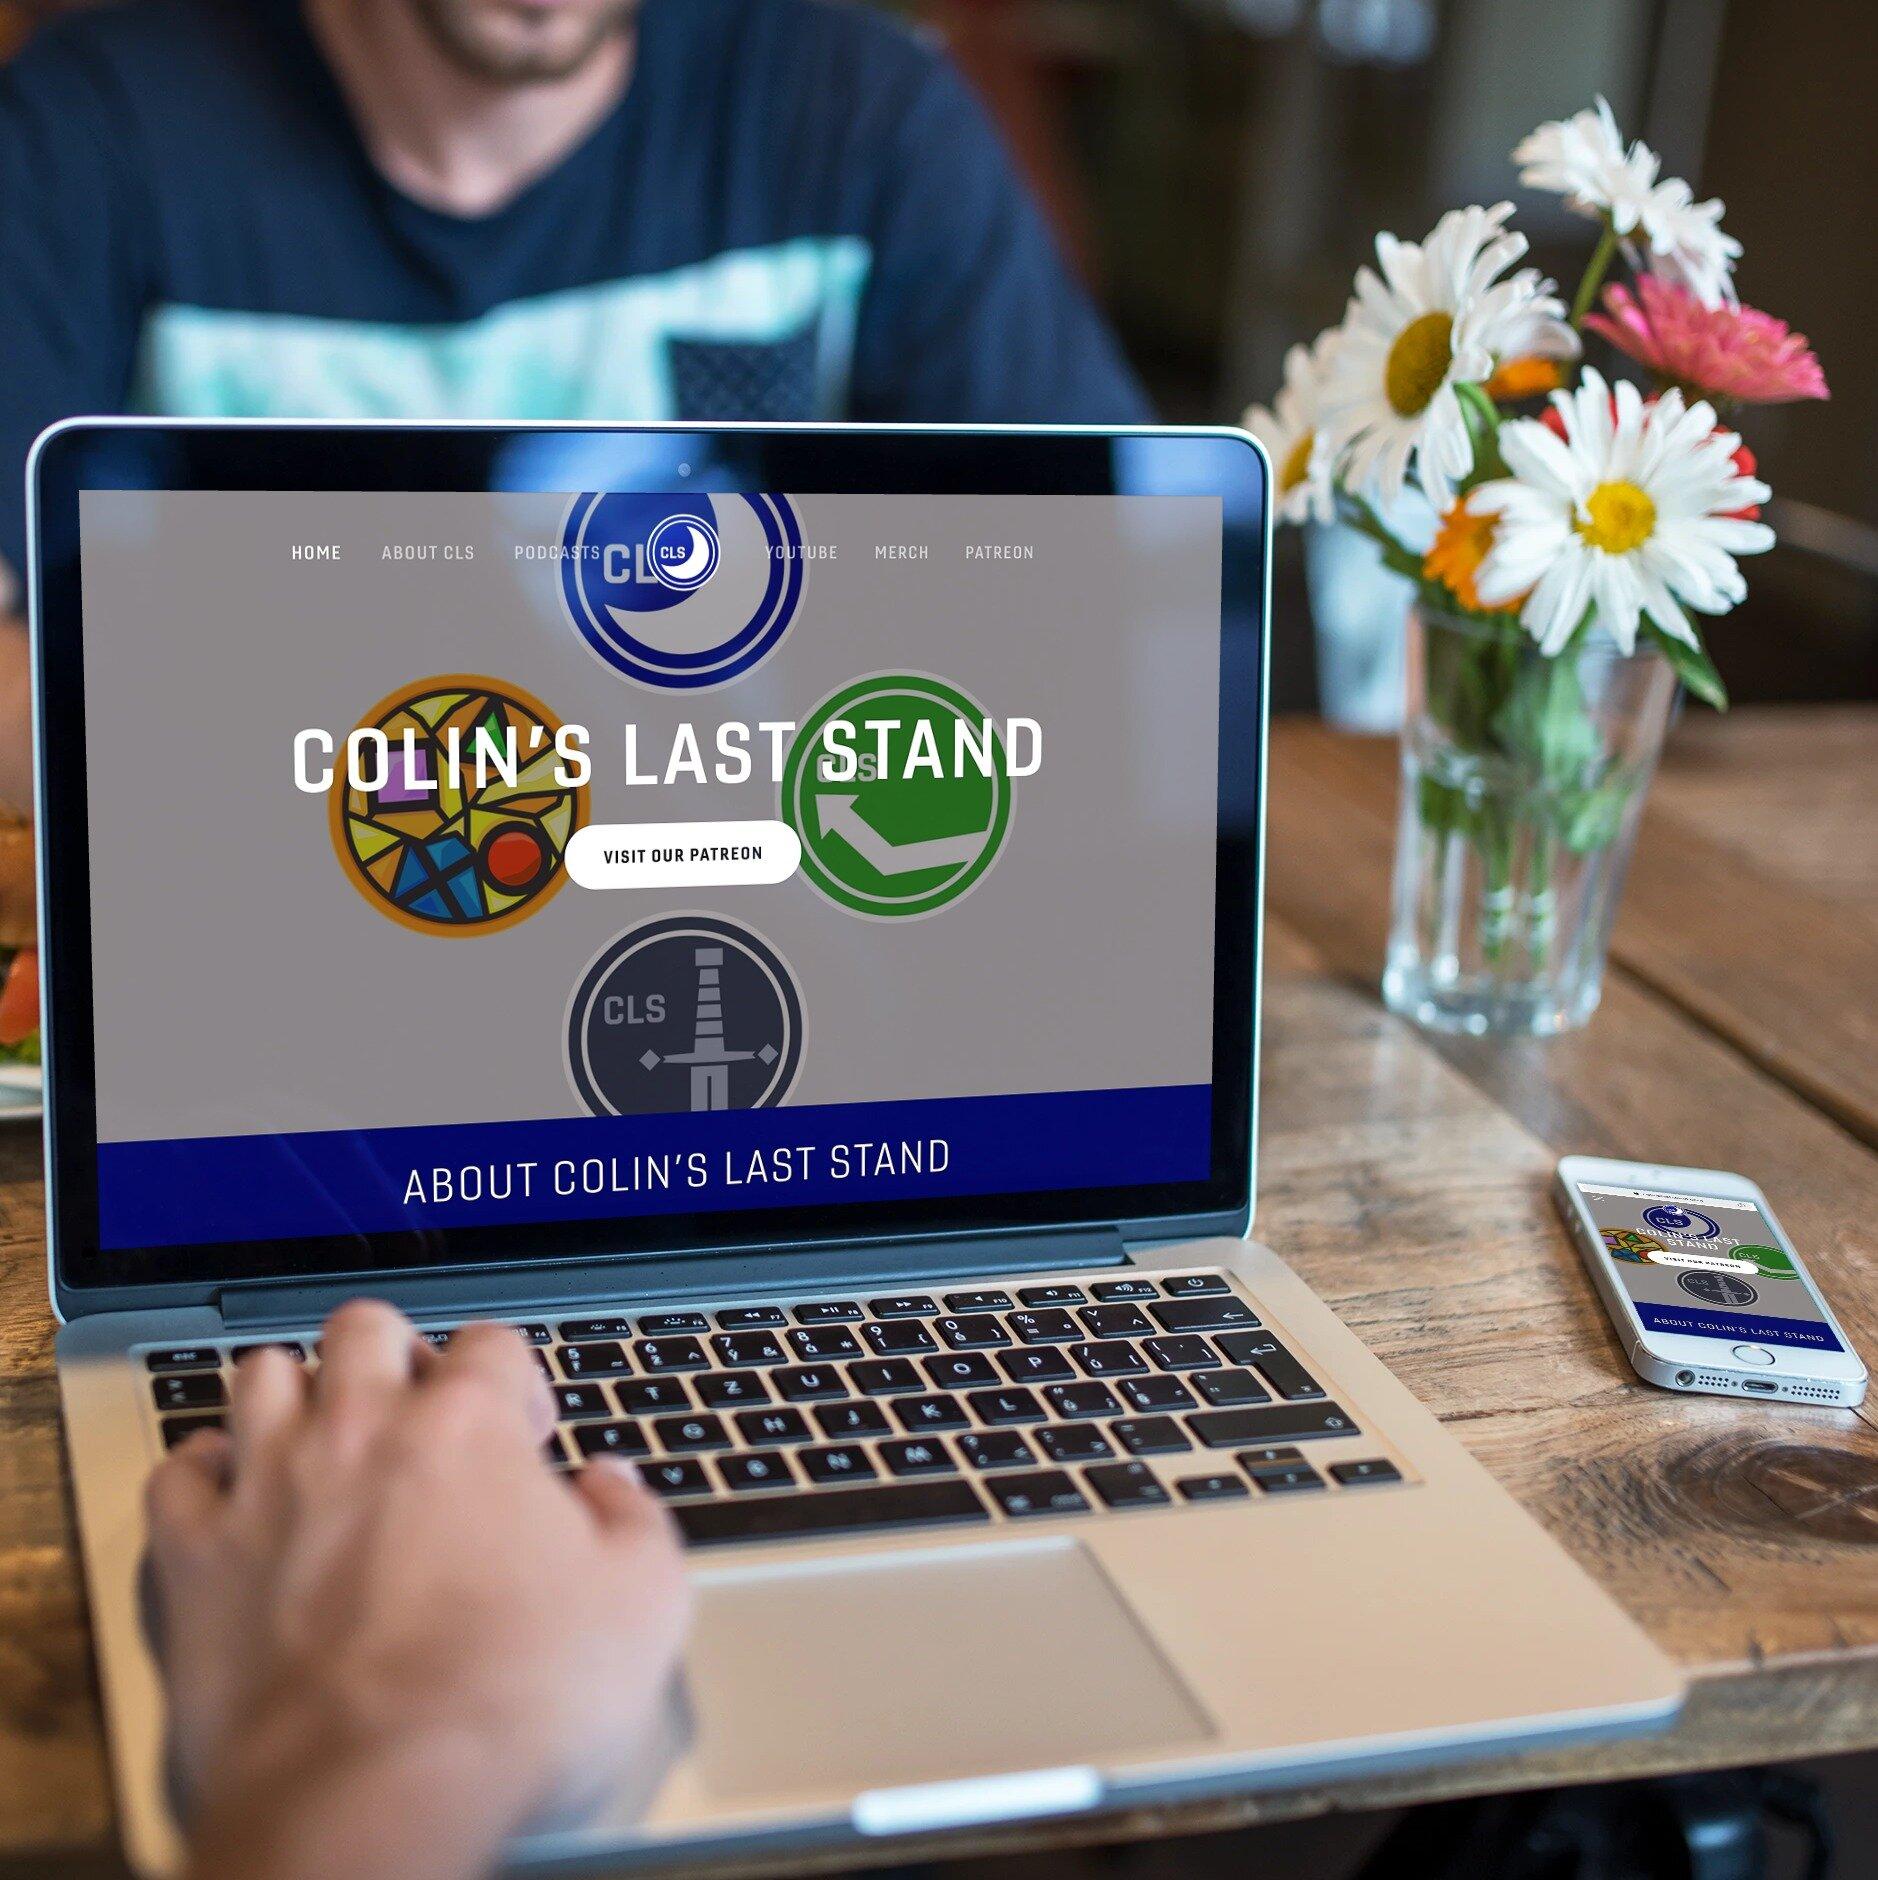 Colin's Last Stand